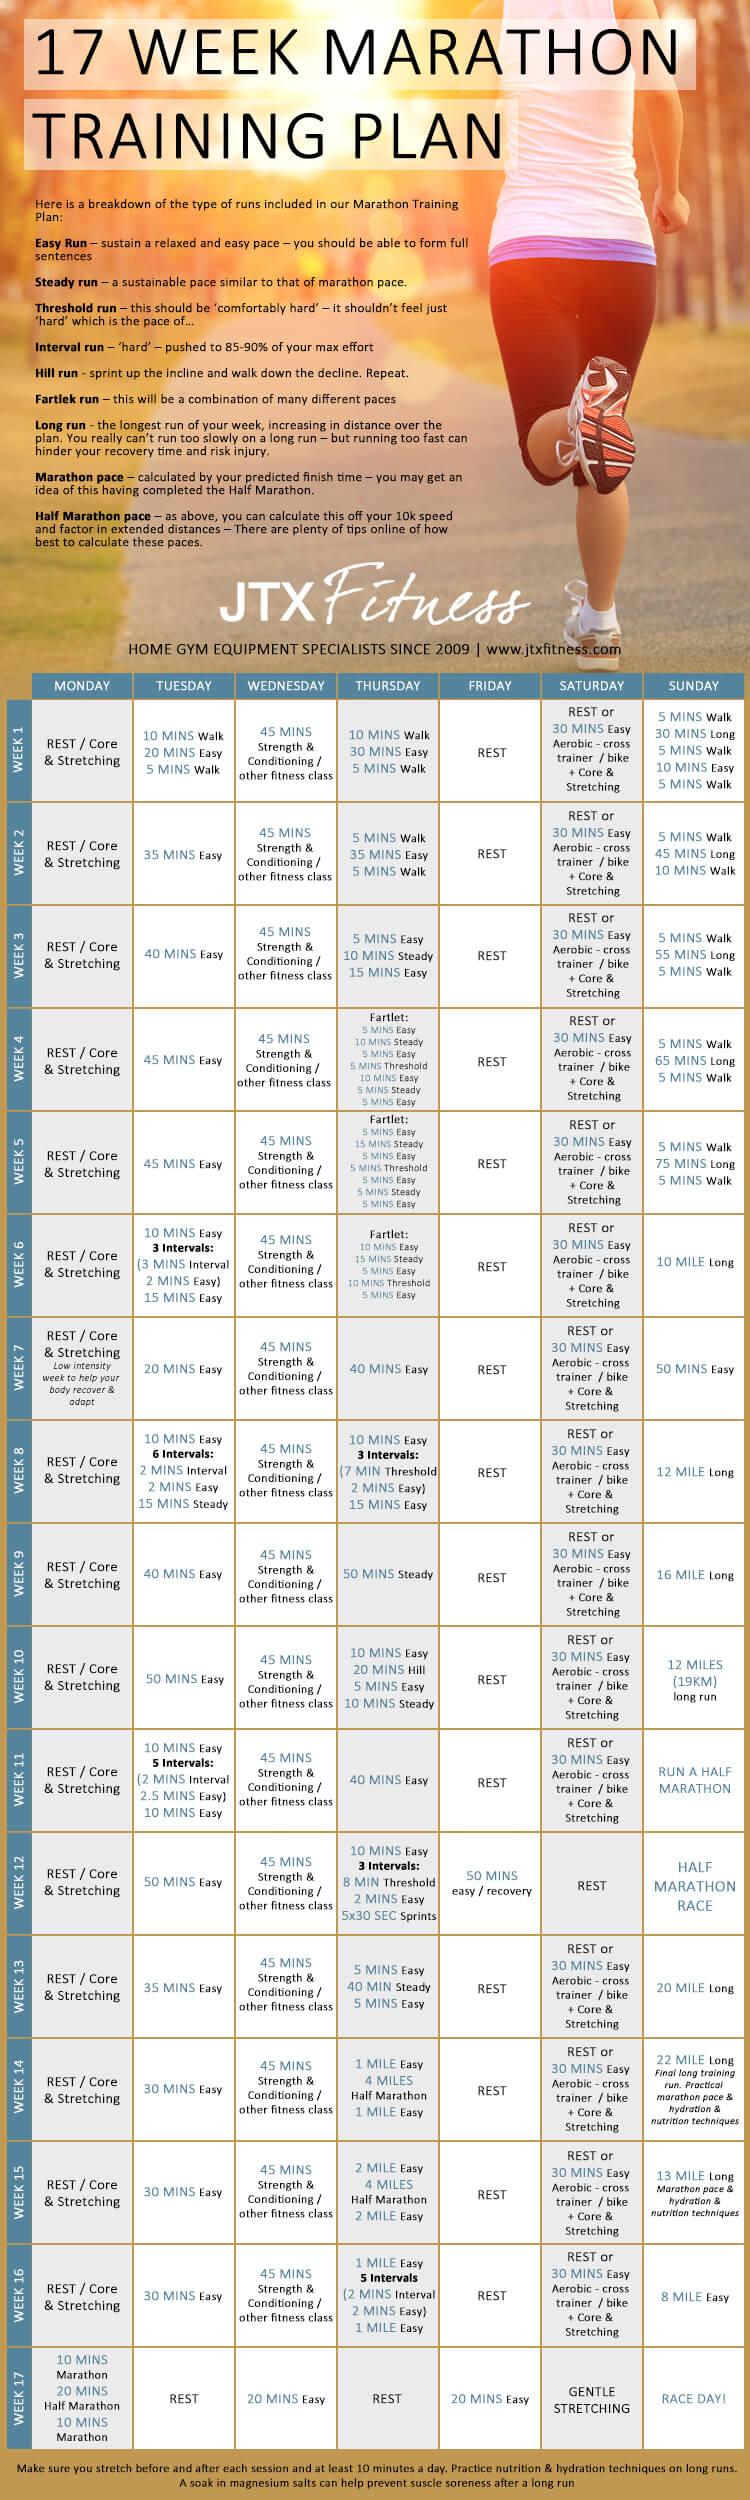 17 Week Marathon Training Plan | JTX Fitness